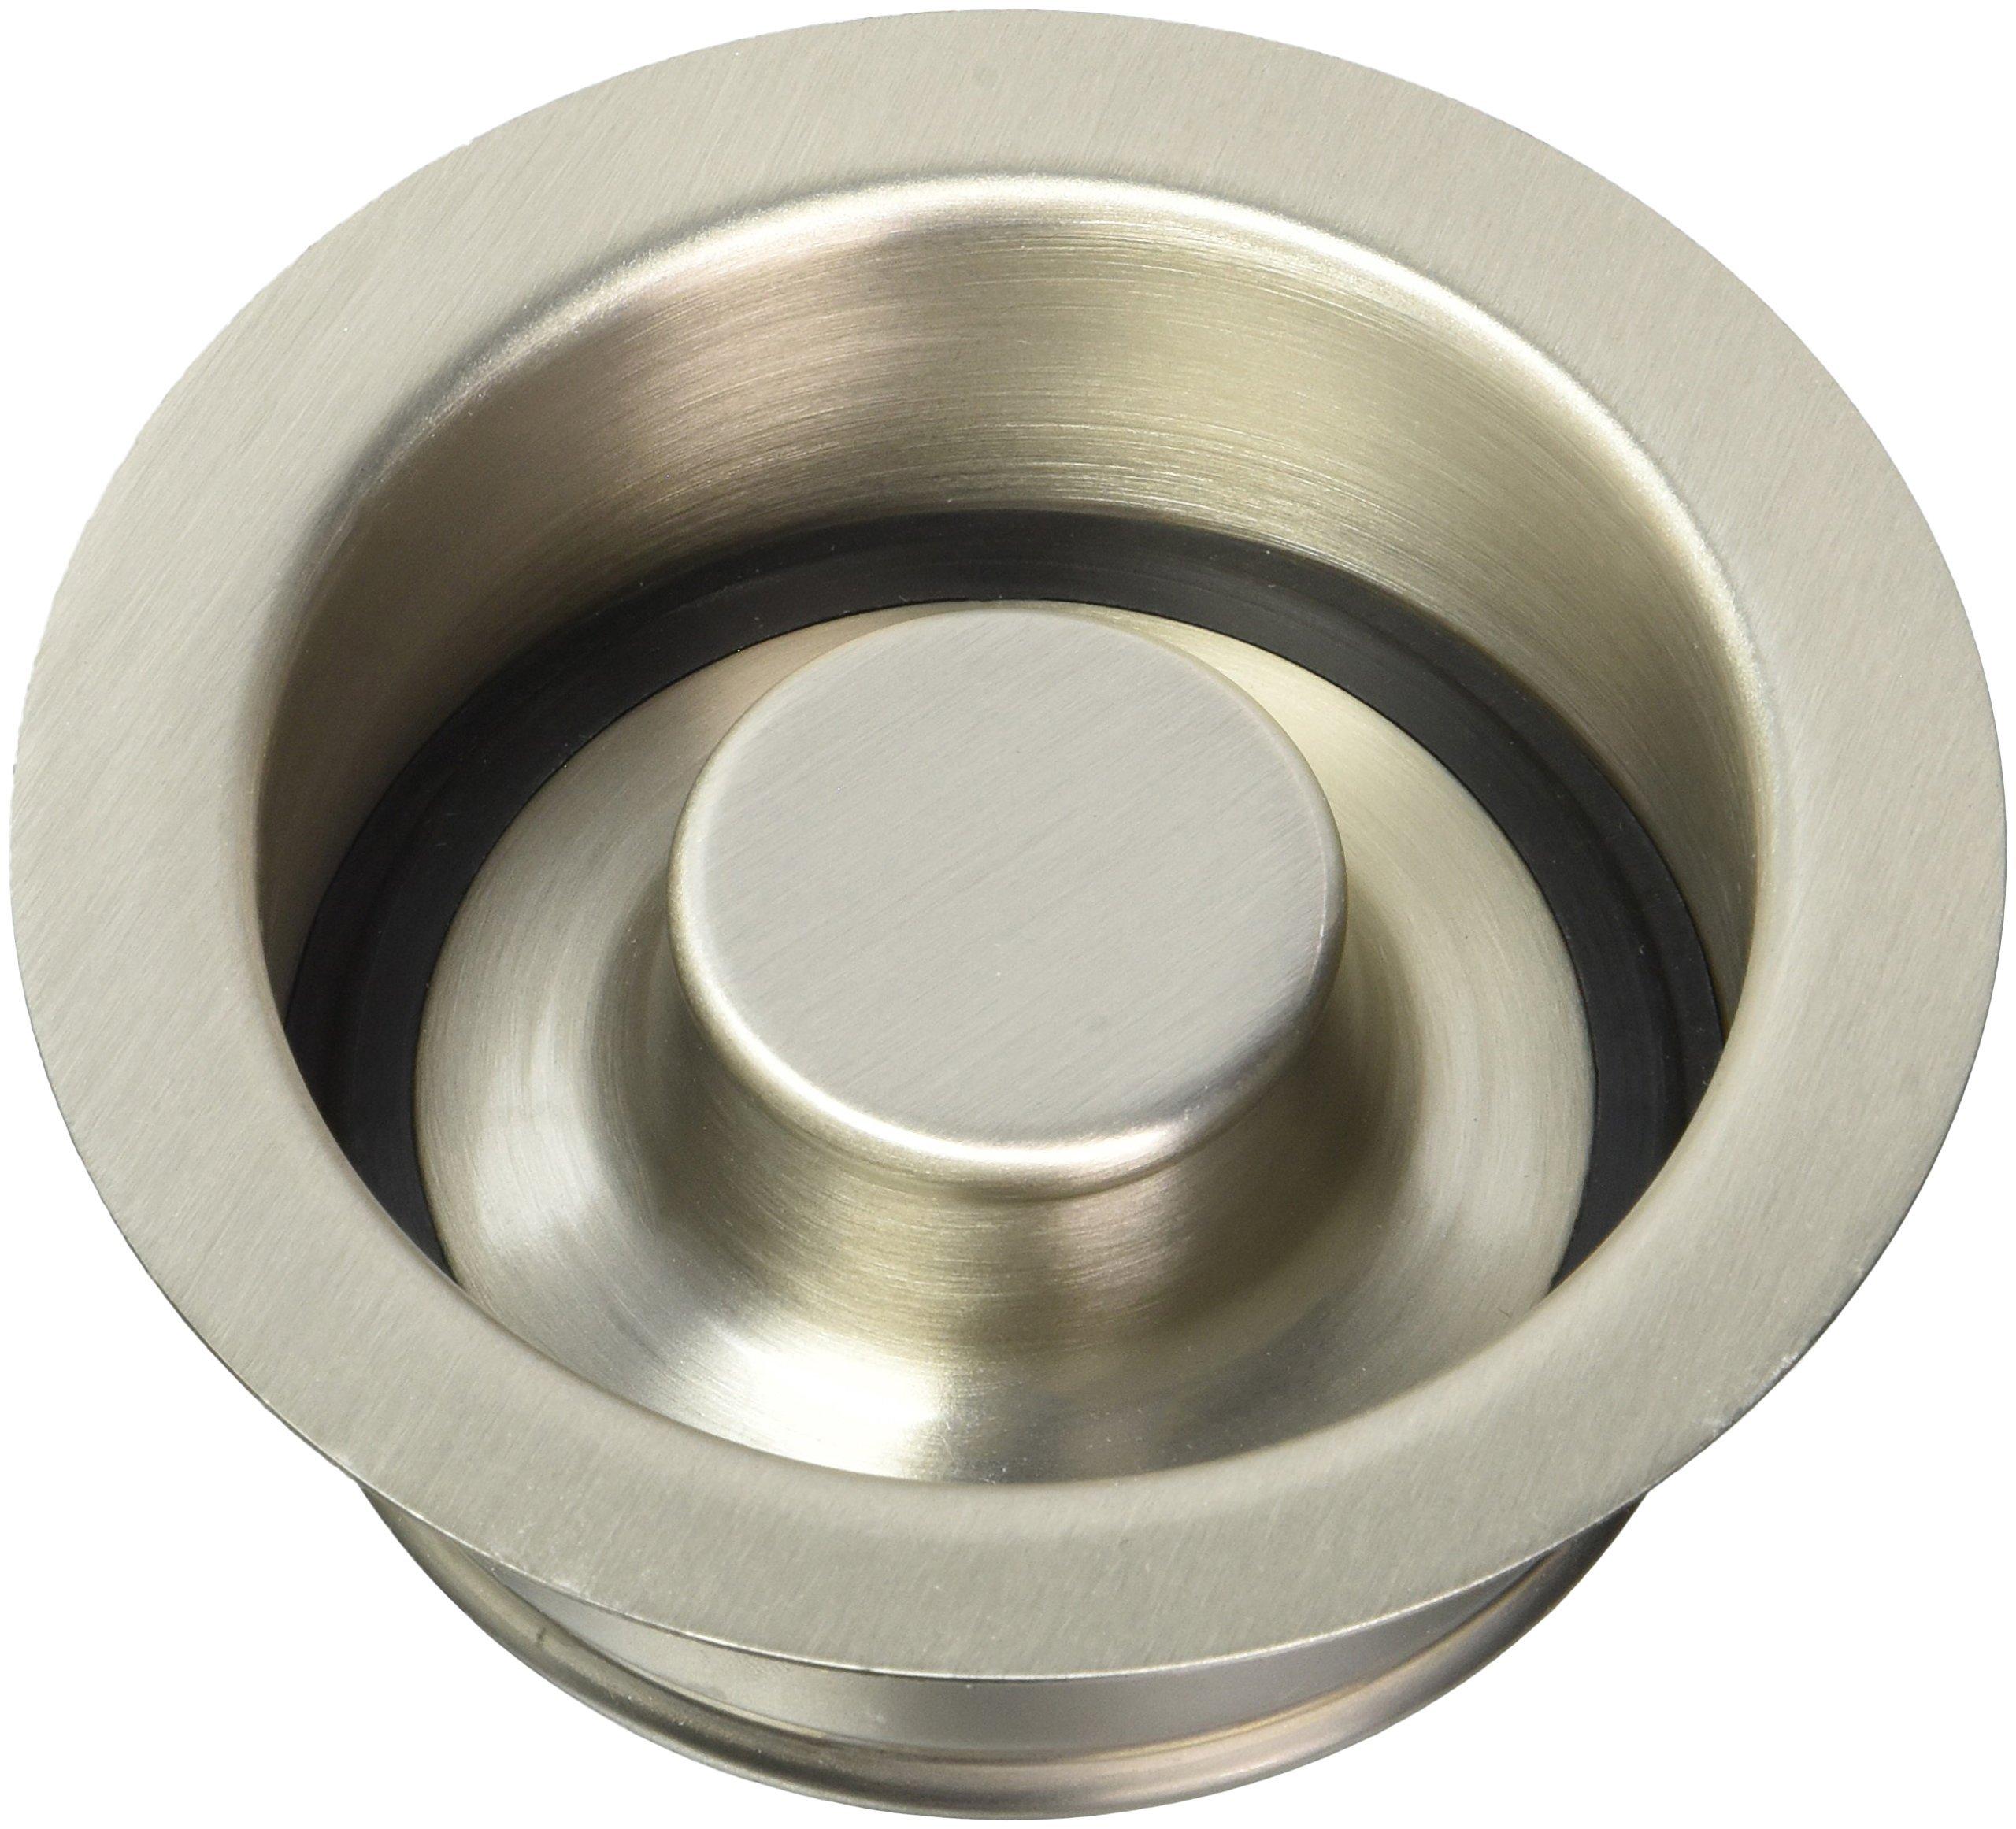 Westbrass D2089-07 FBA_D2089-07 Disposal Flange Satin Nickel